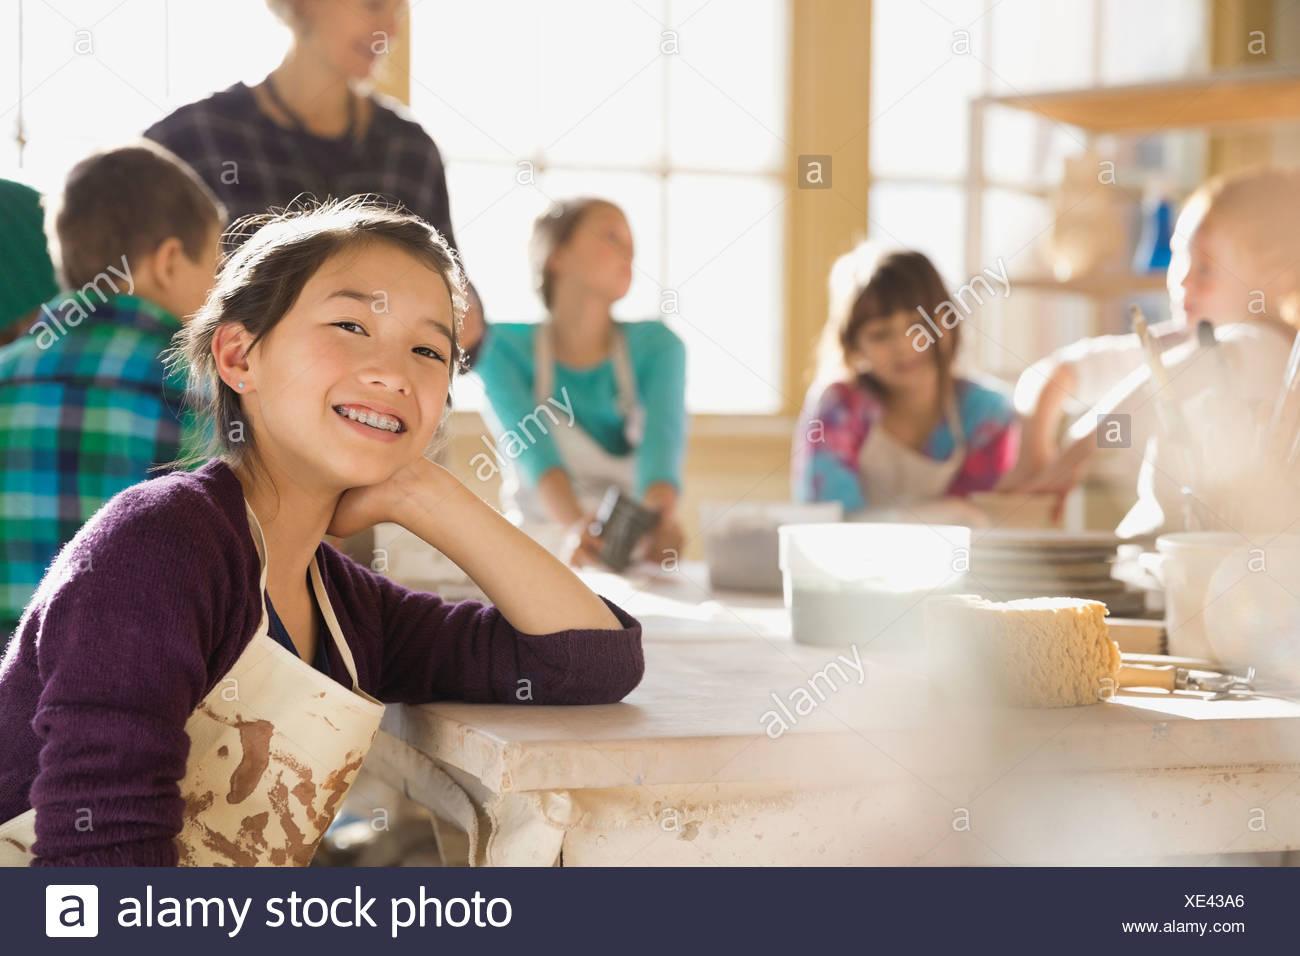 Portrait of girl in art class - Stock Image